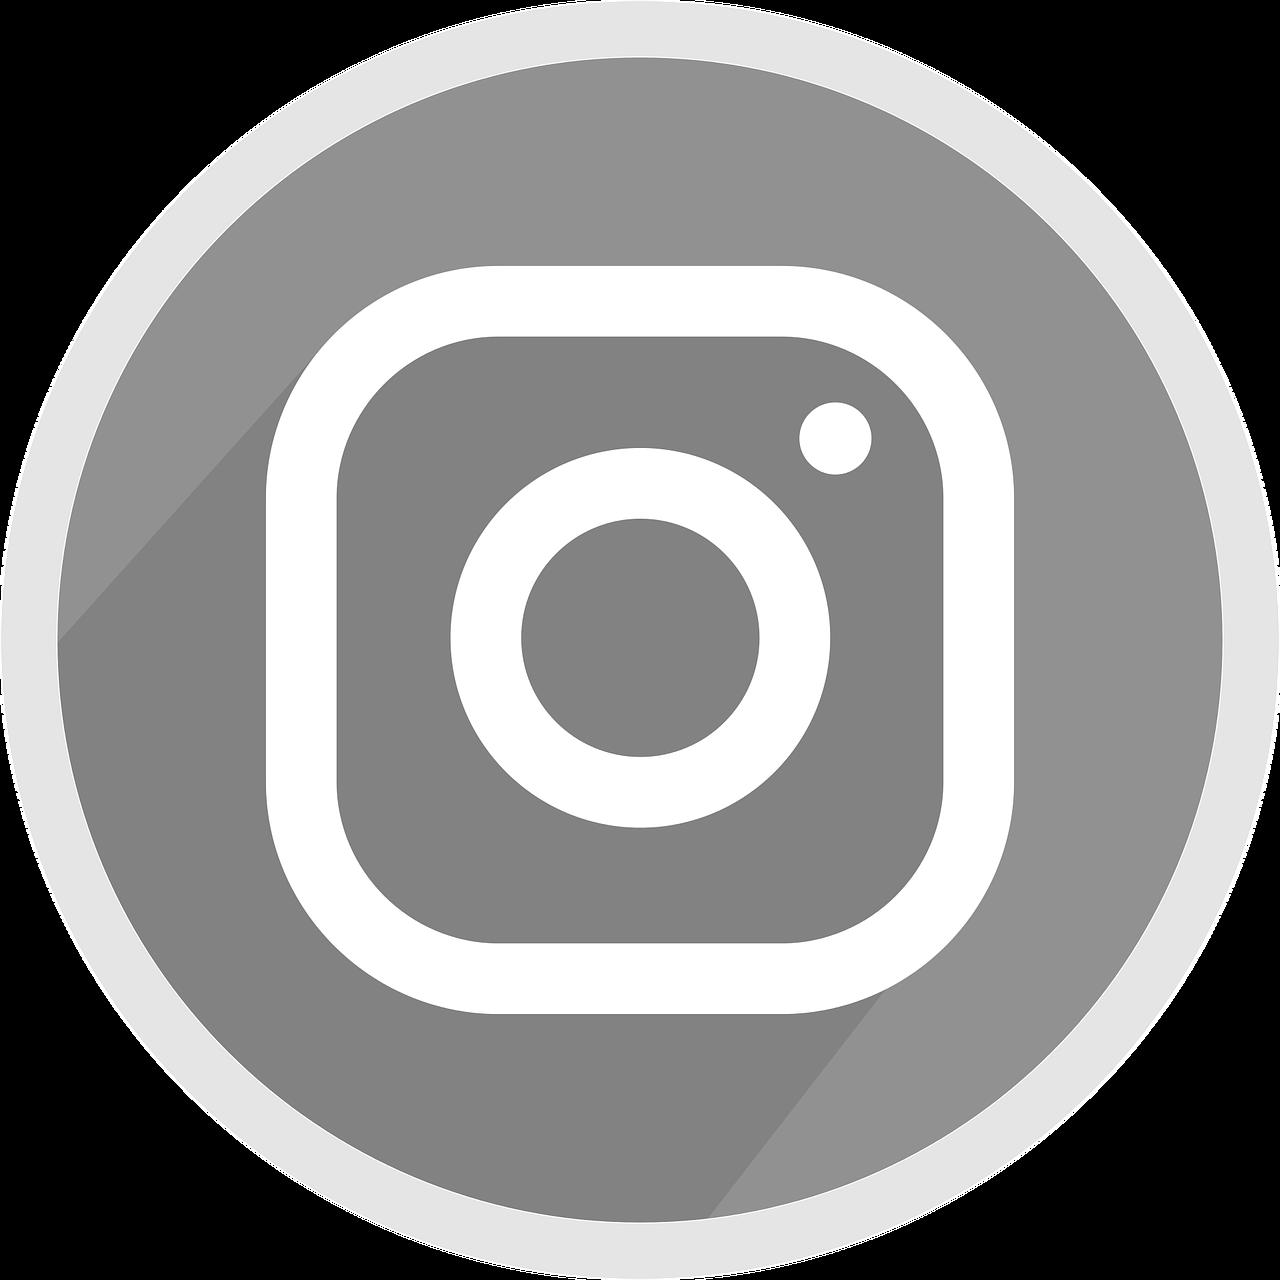 Logo Instagram Icon Grey Free - Free vector graphic on Pixabay